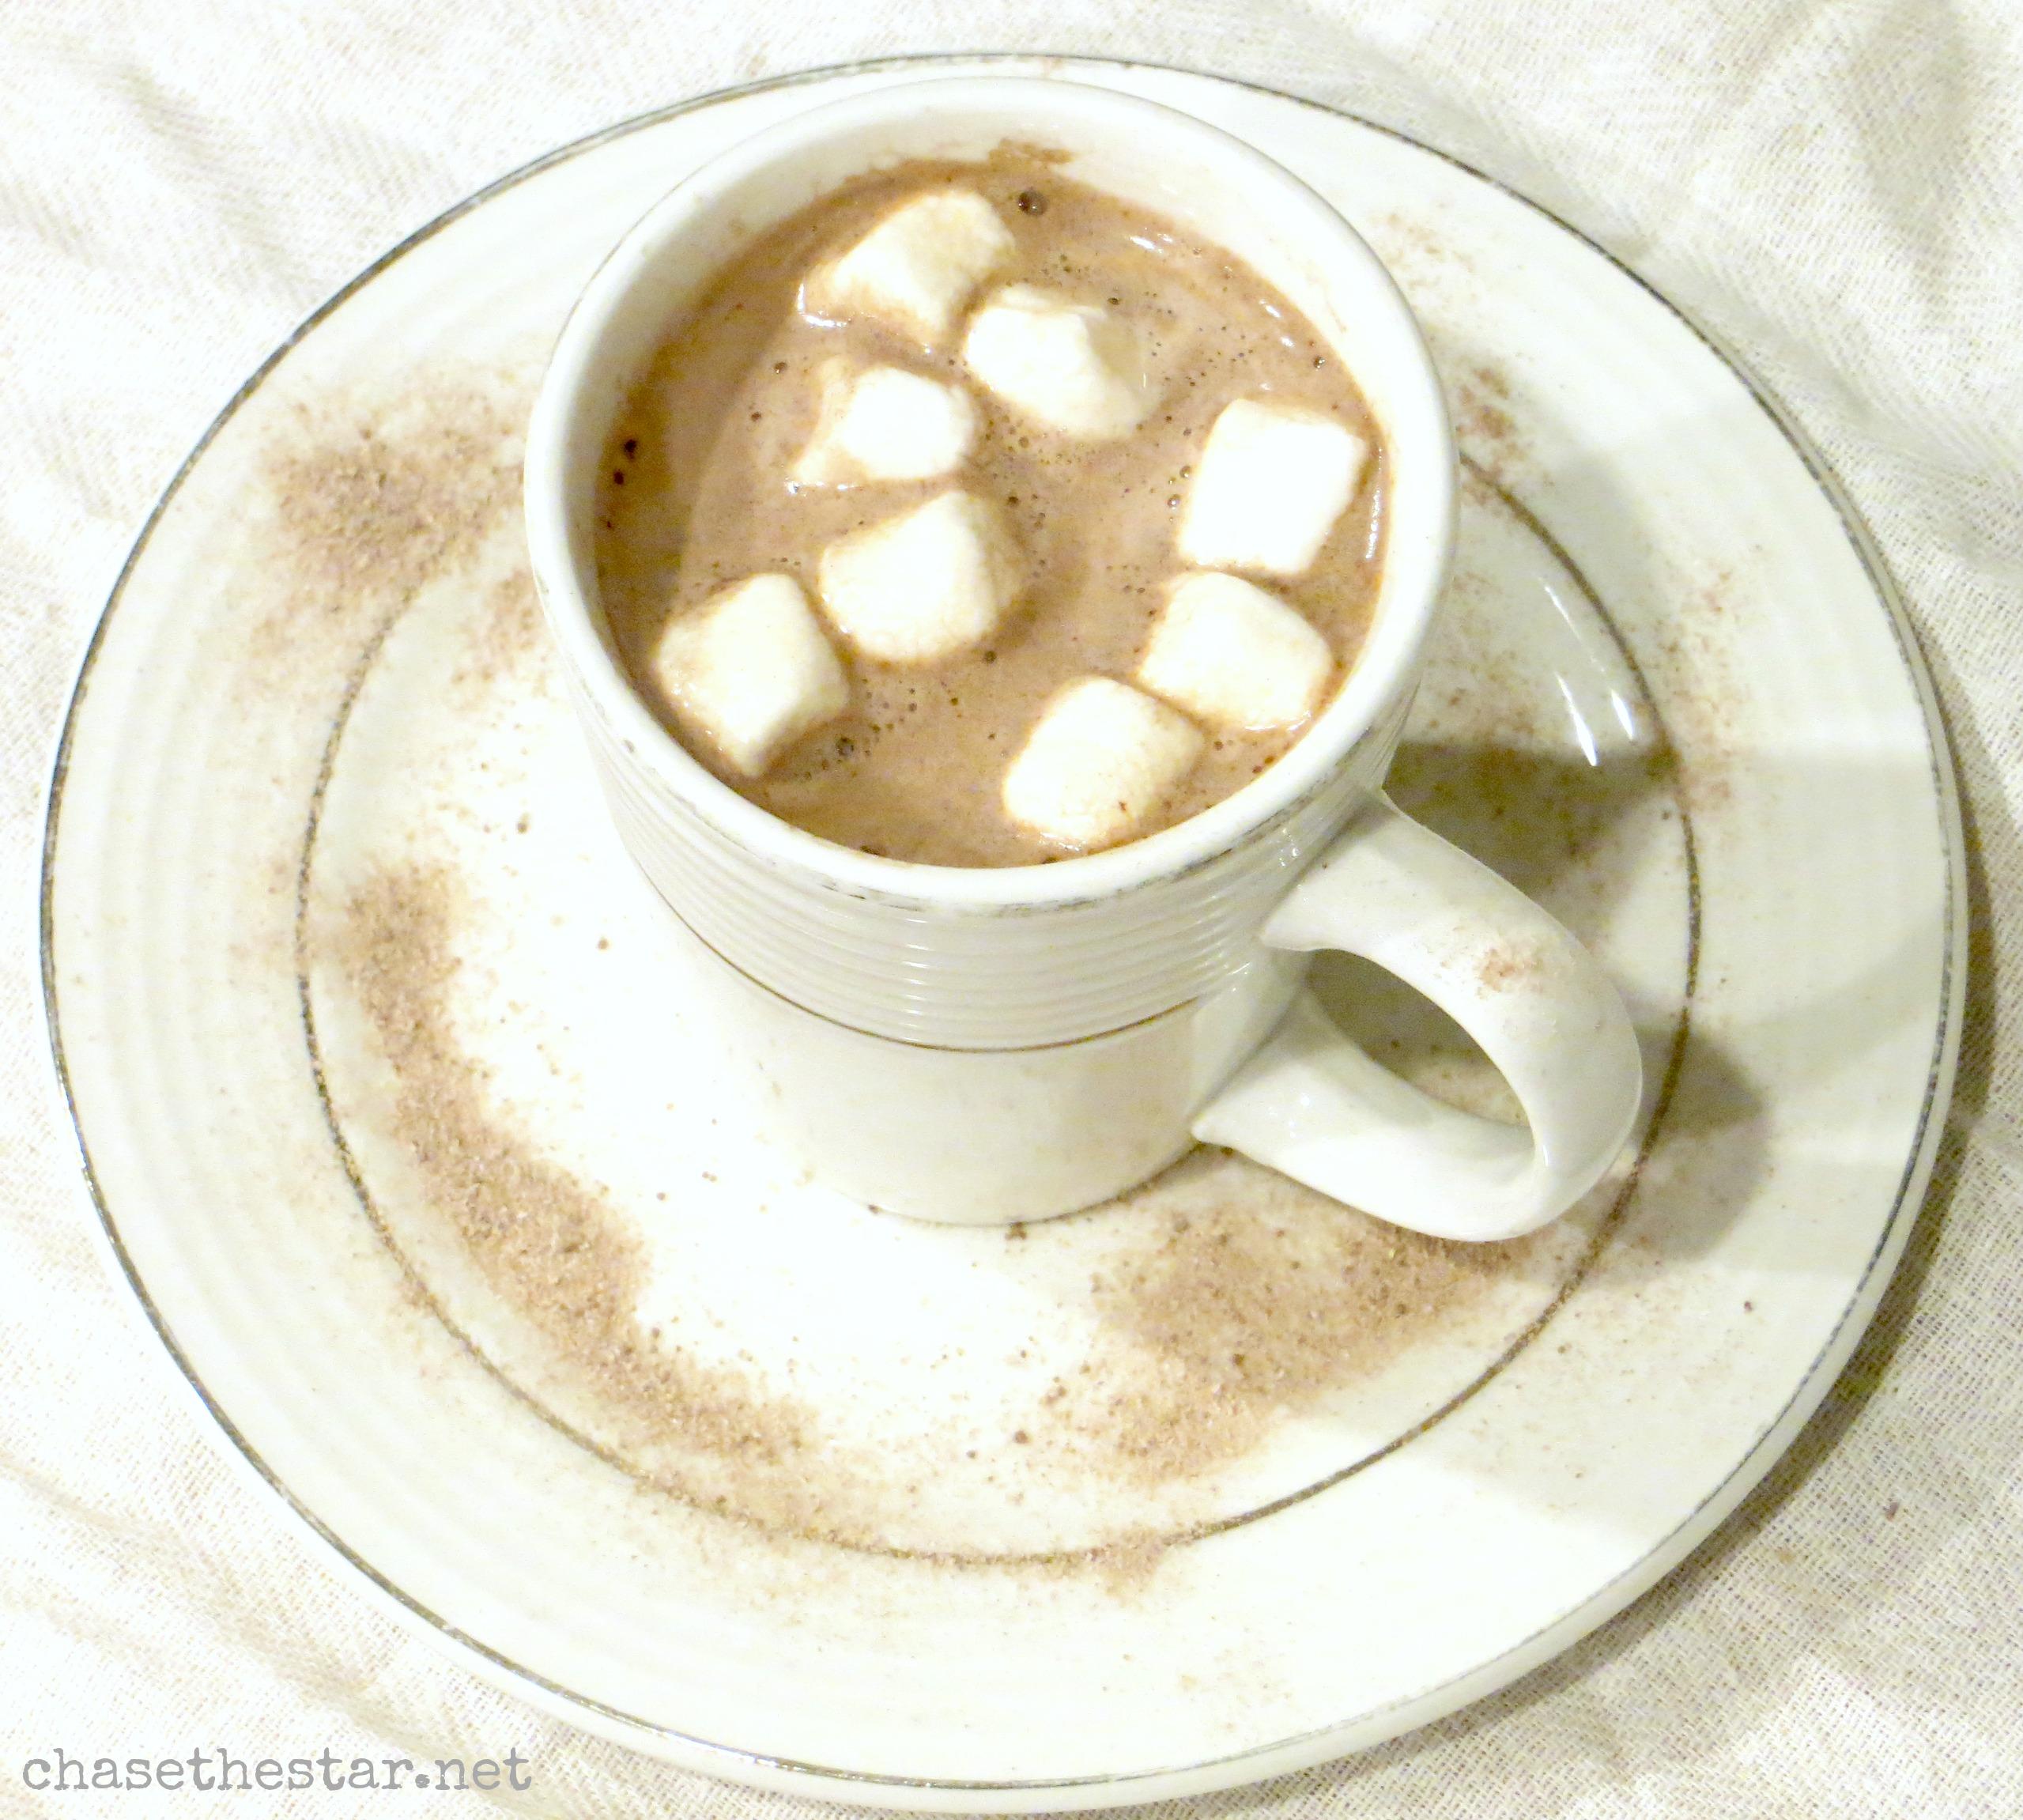 homemade hot cocoa, chocolate